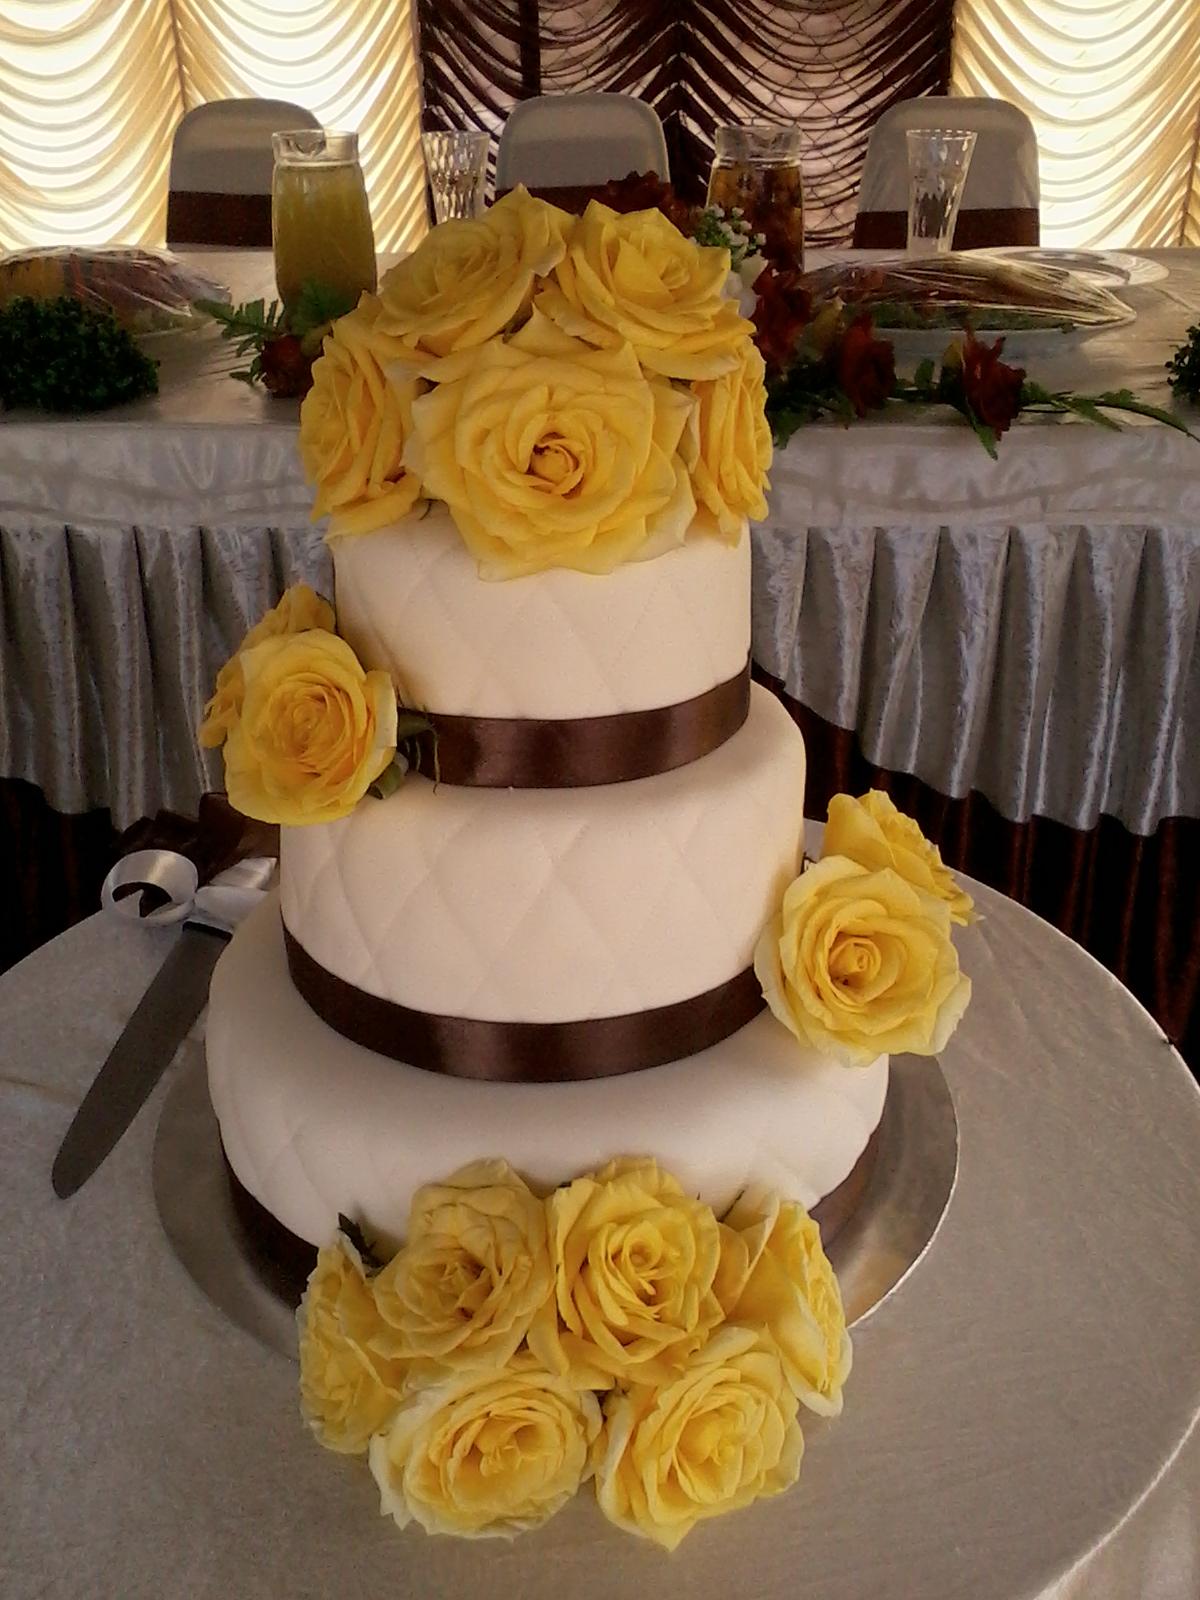 jujucupcakes: Brown and yellow wedding cake